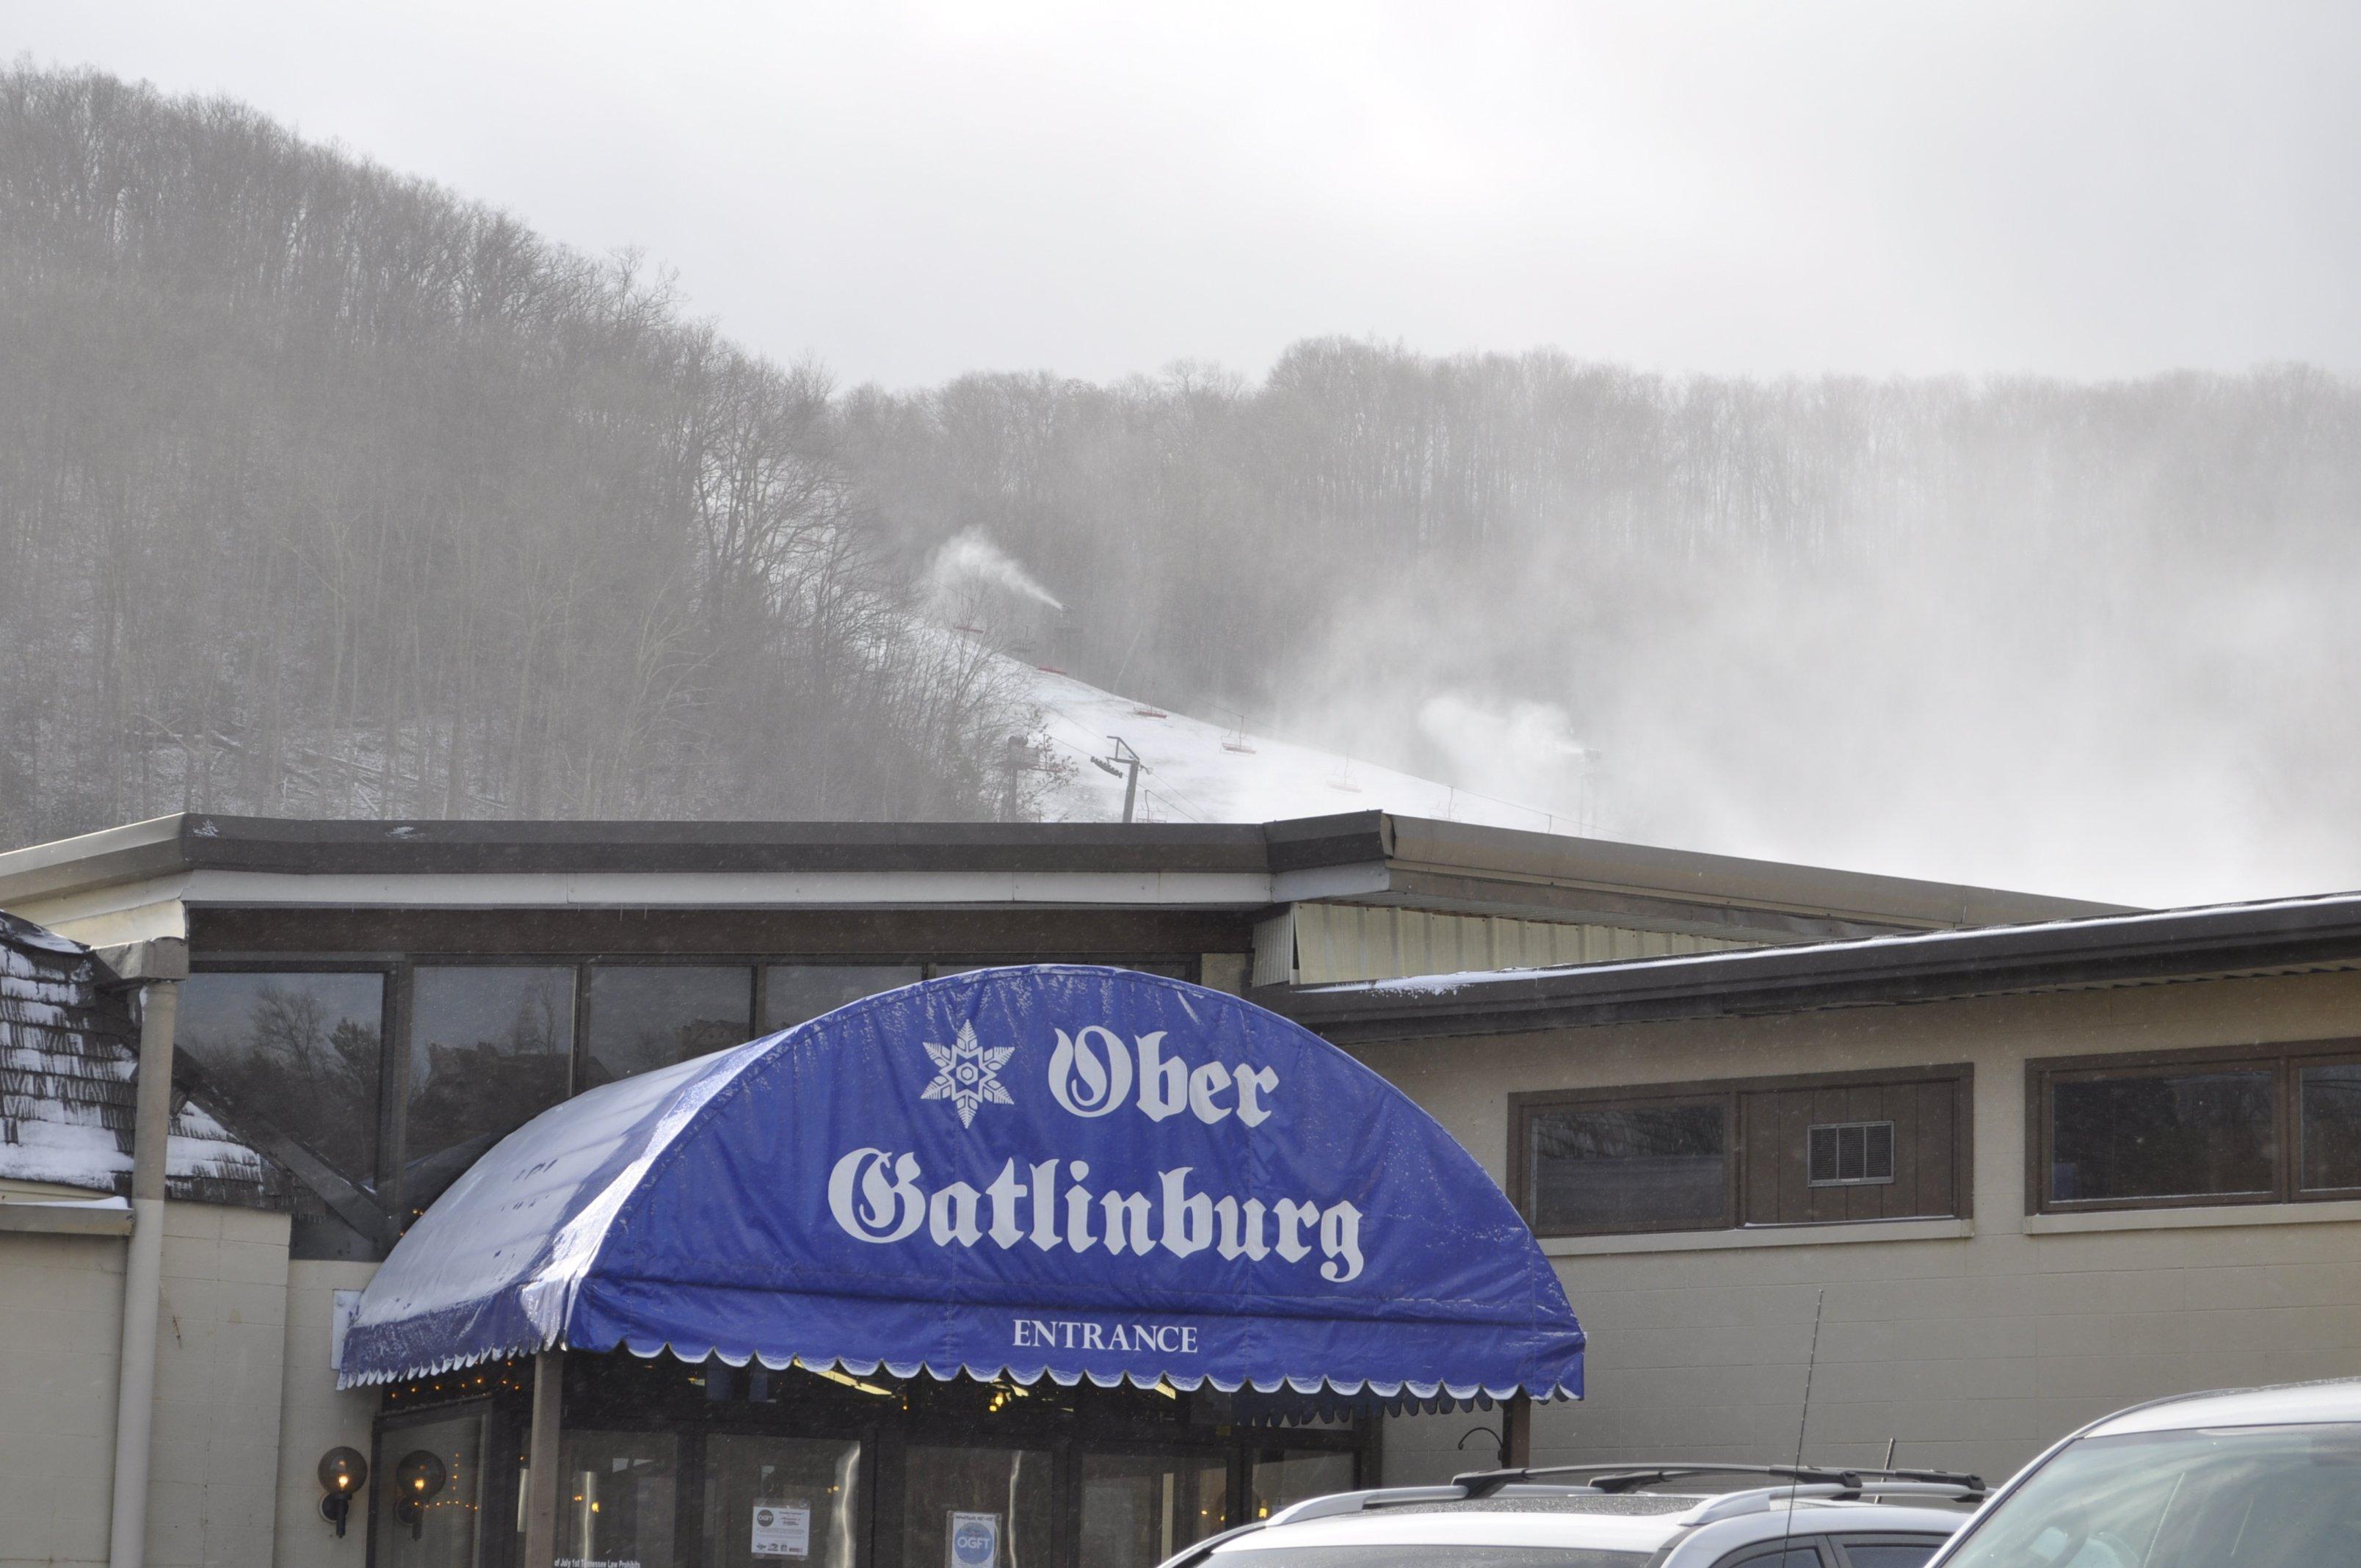 Gatlinburg to celebrate new year with annual ball drop for Cabins near ober ski resort gatlinburg tn